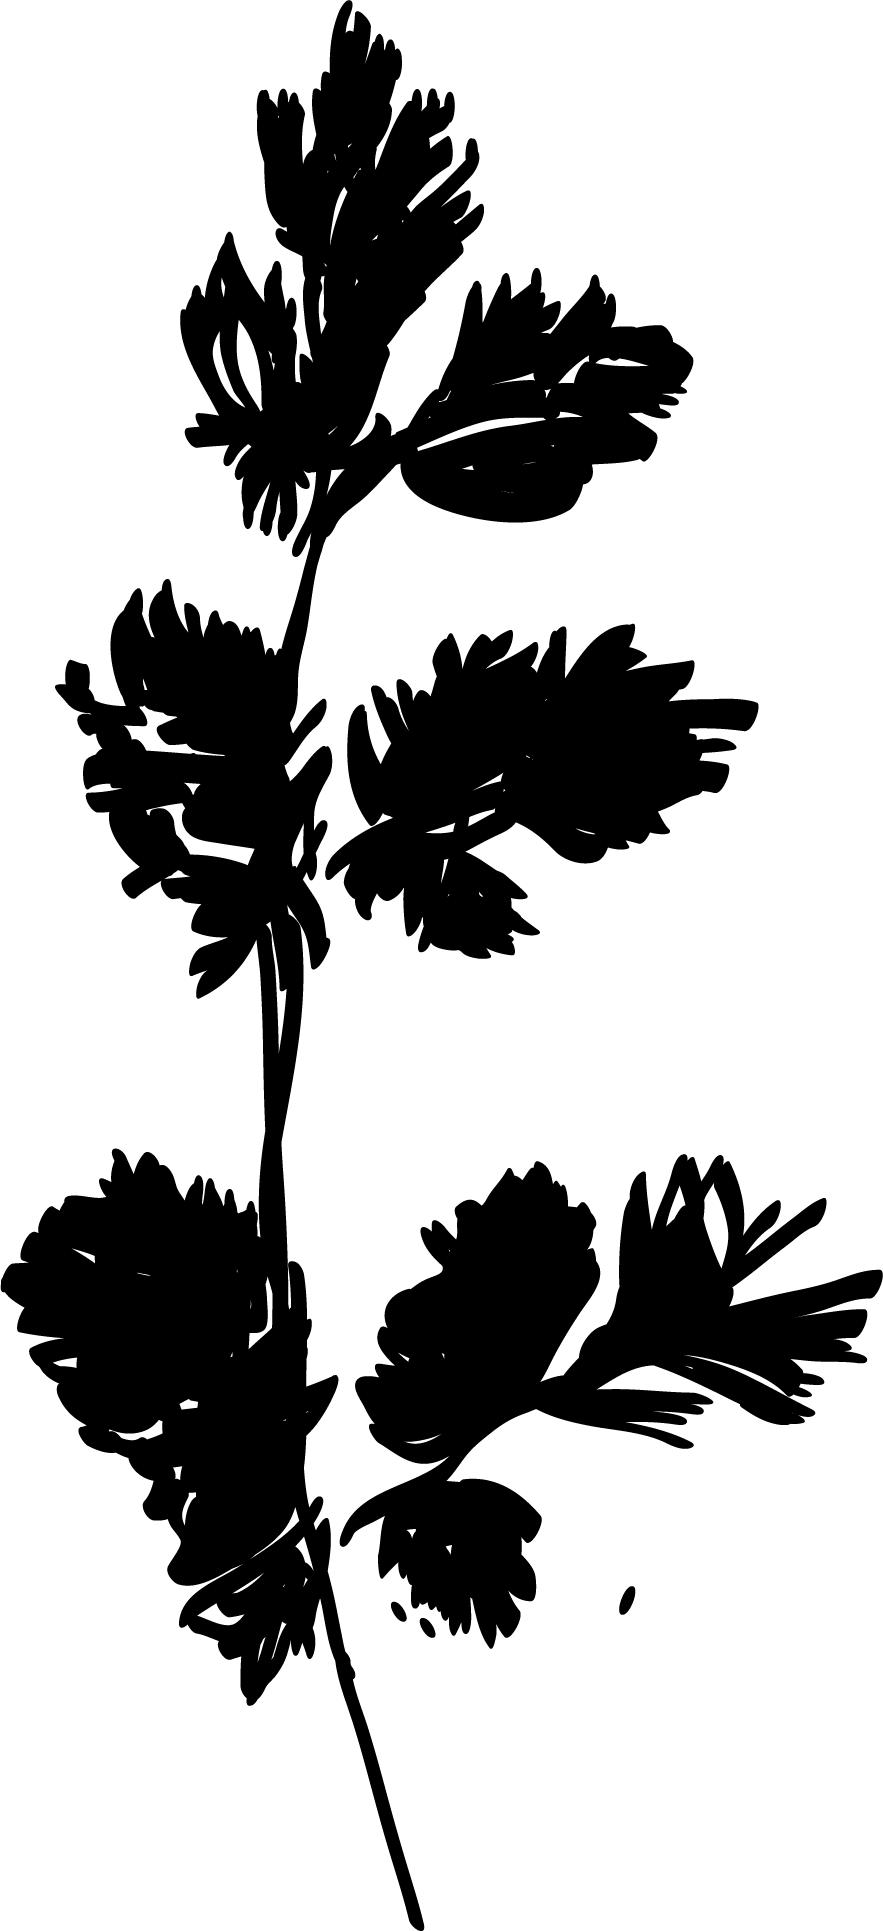 Re-drawn in Adobe Illustrator CC 2017